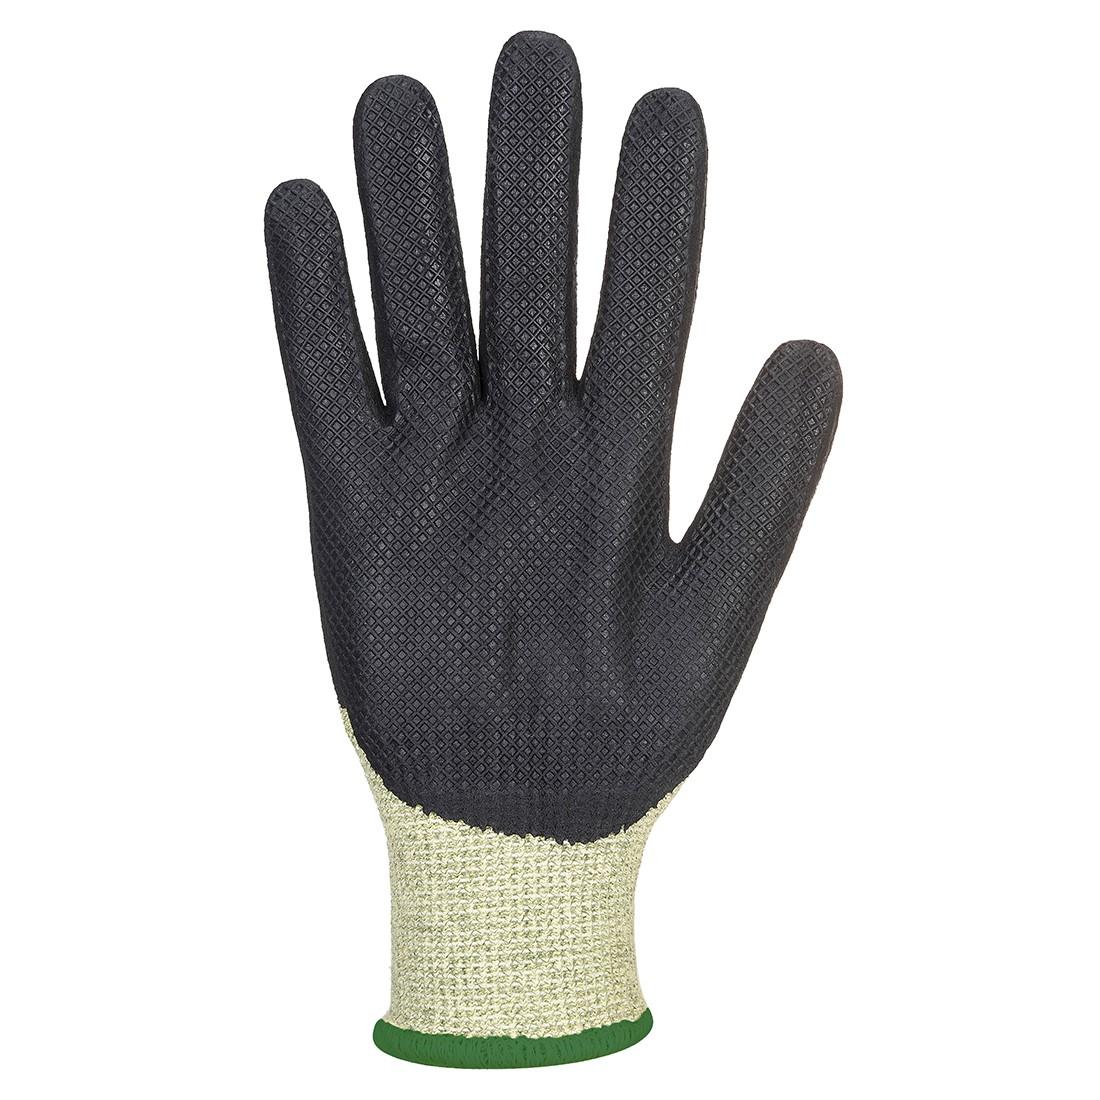 Manusa Arc Grip - Echipamente de protectie personala